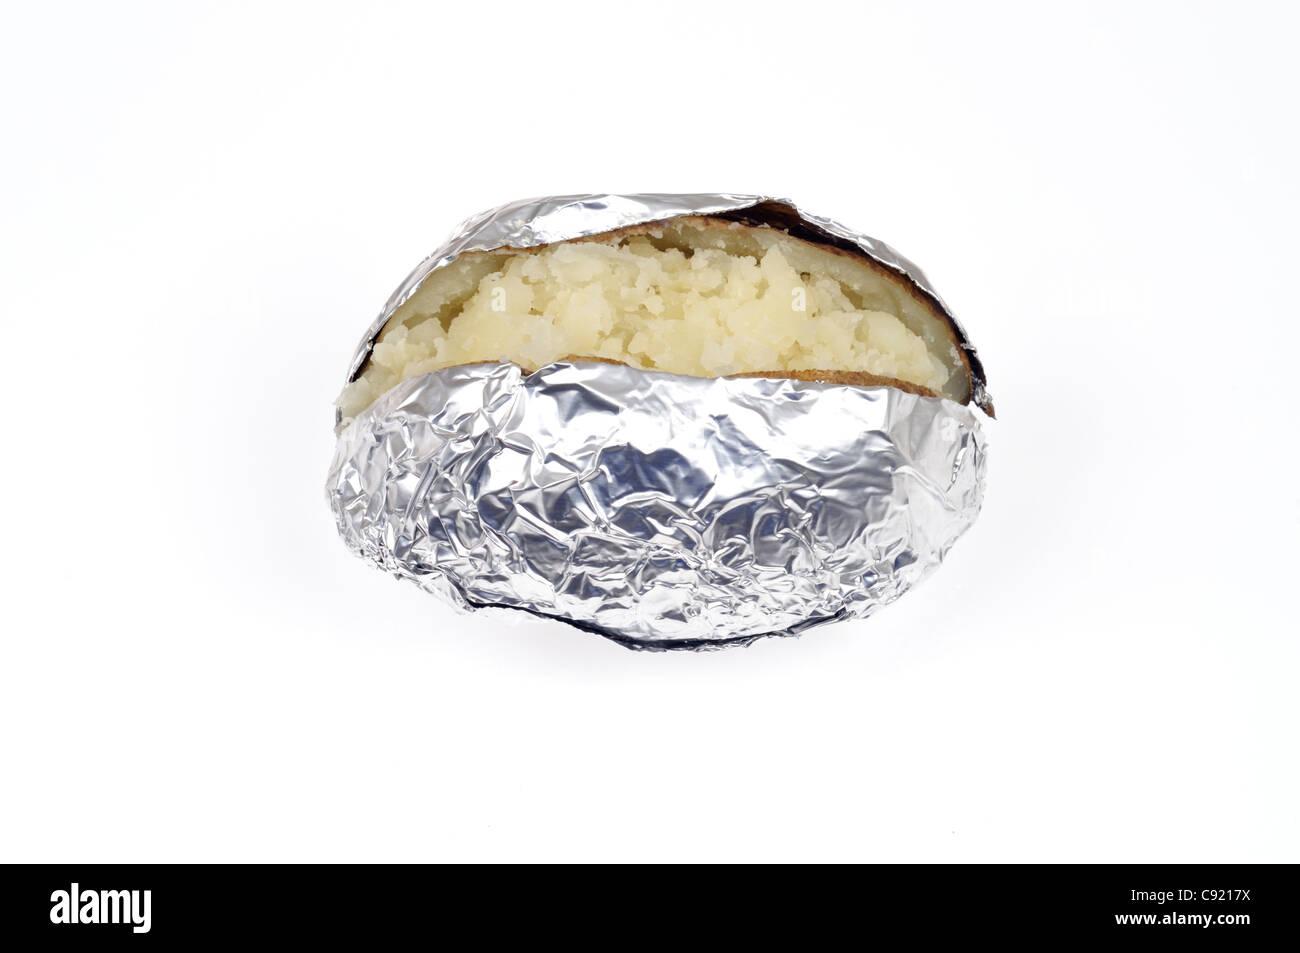 Cooked plain baked jacket potato wrapped aluminum foil on white background cutout. - Stock Image